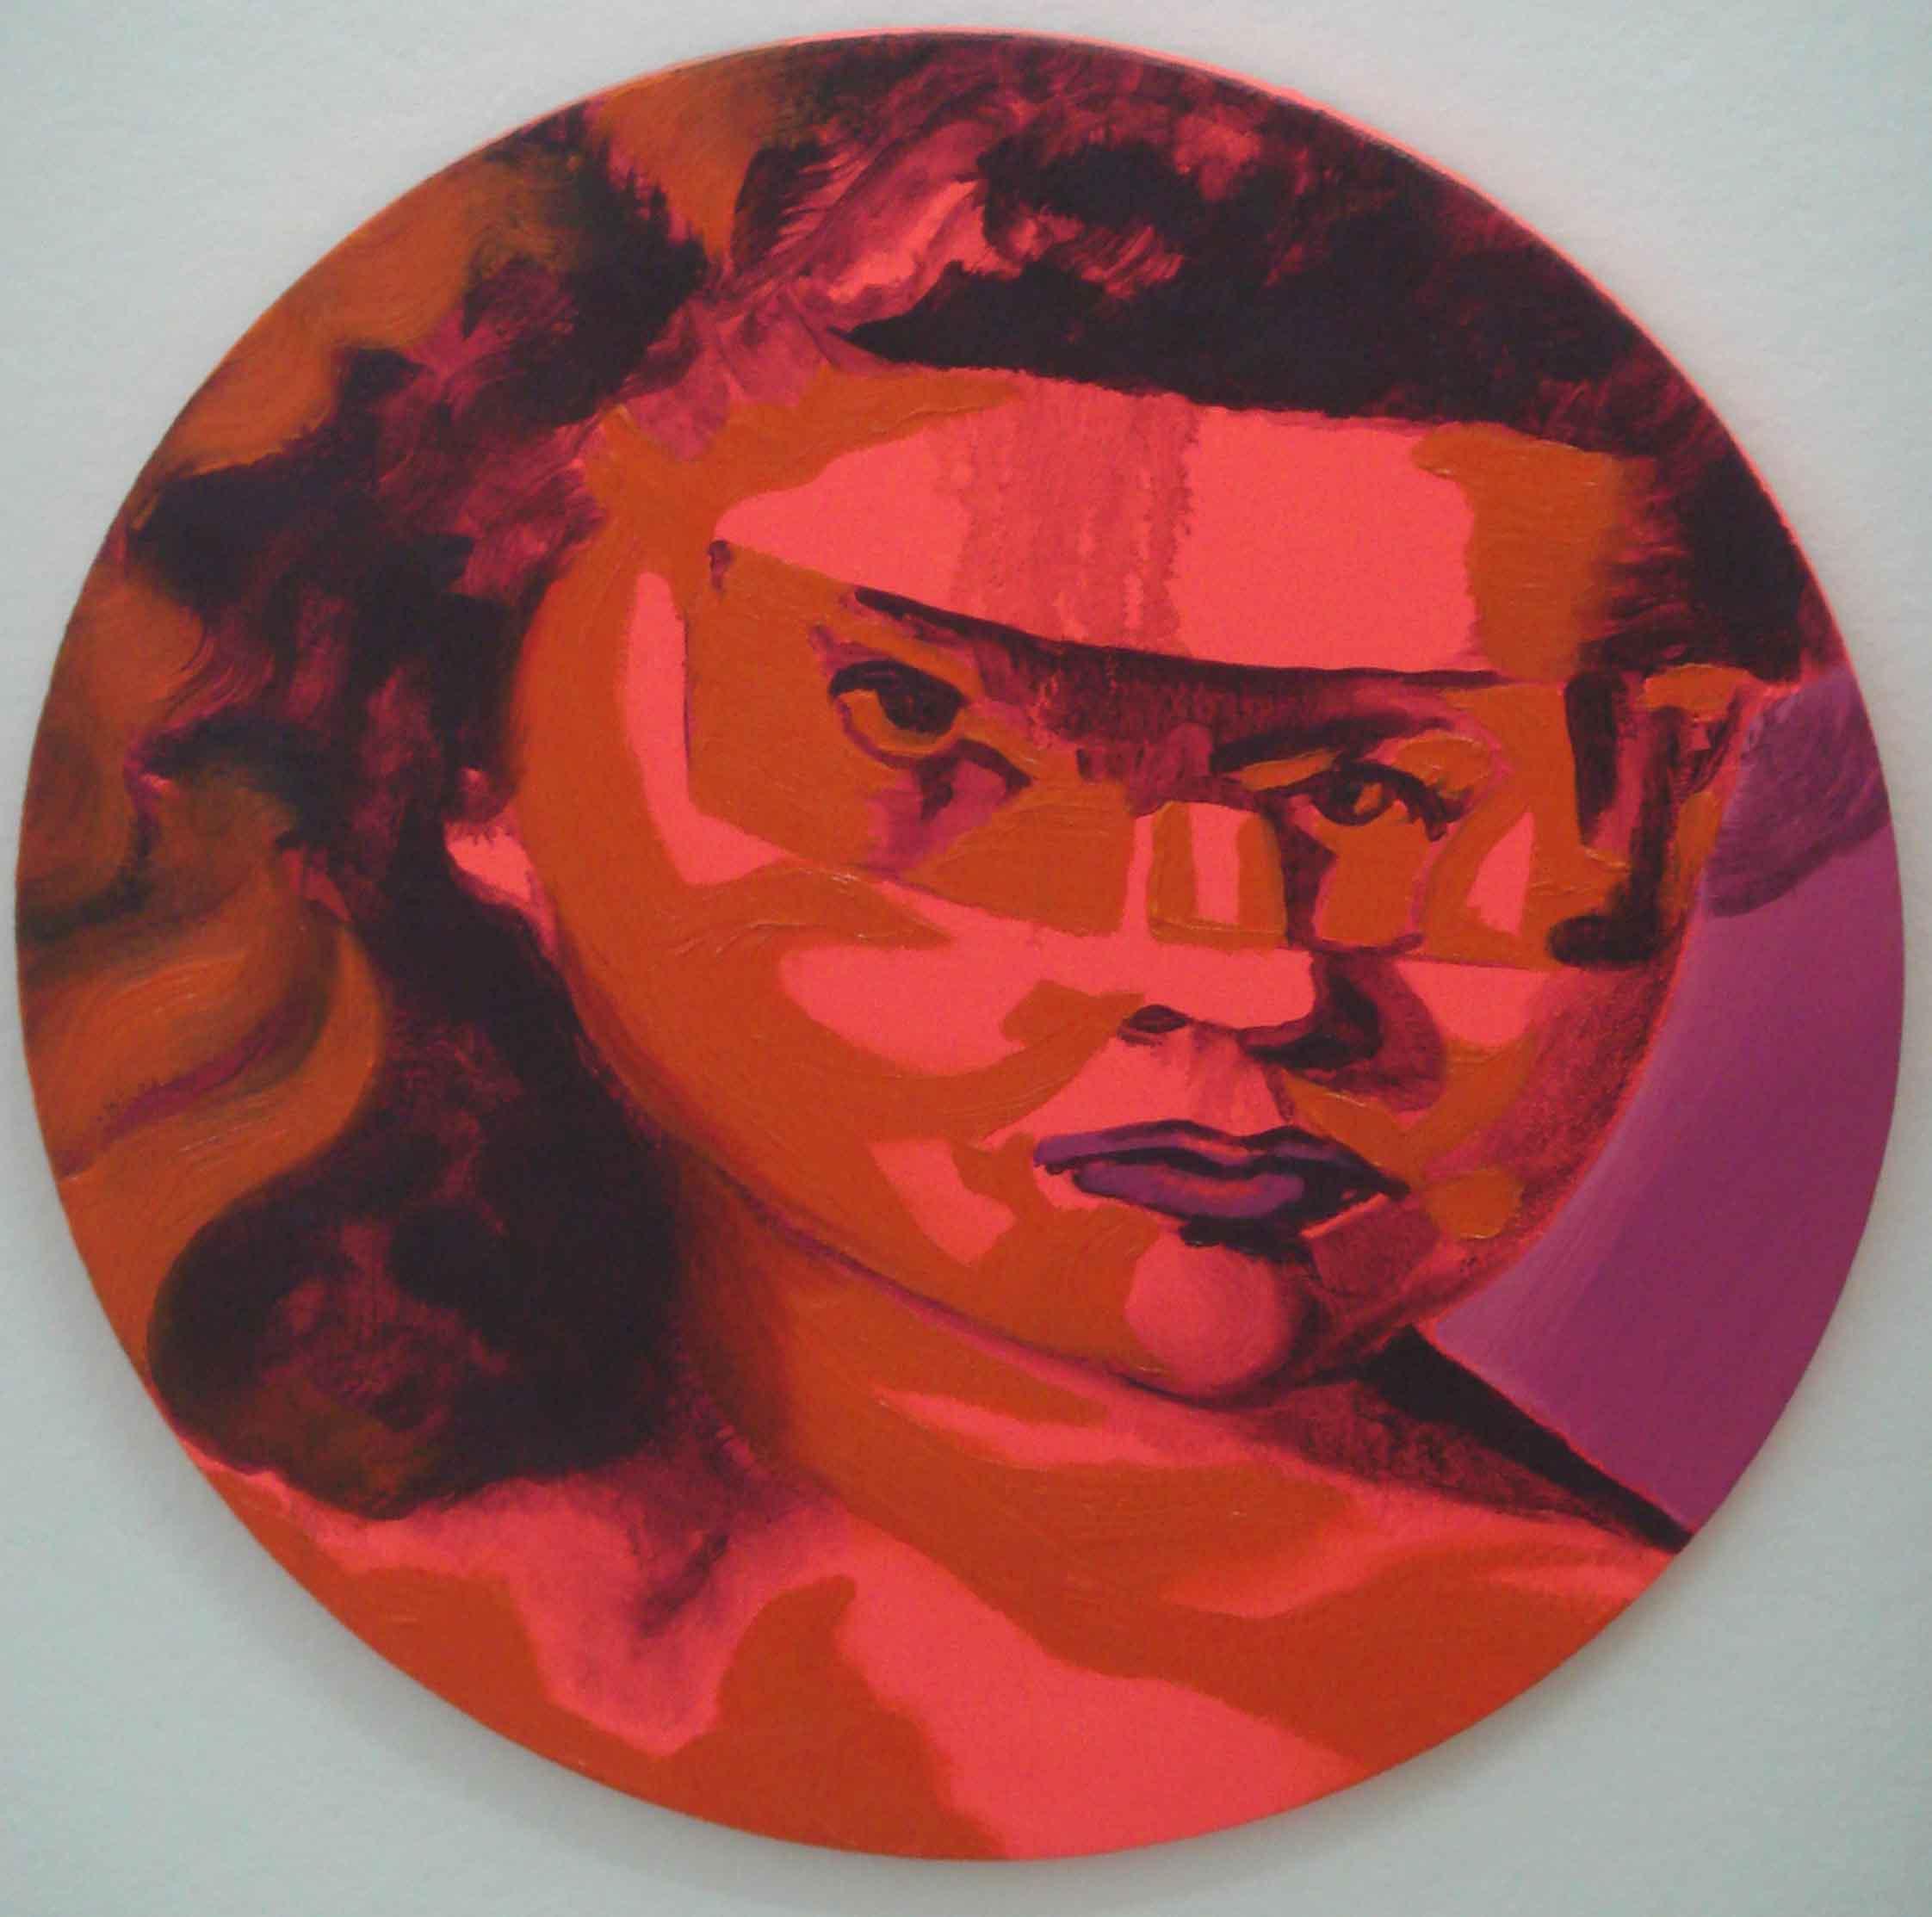 NANA OHNESORGE  Stepping Stones # 4  2006 Acrylic & oil on canvas Diameter 40.04 cm